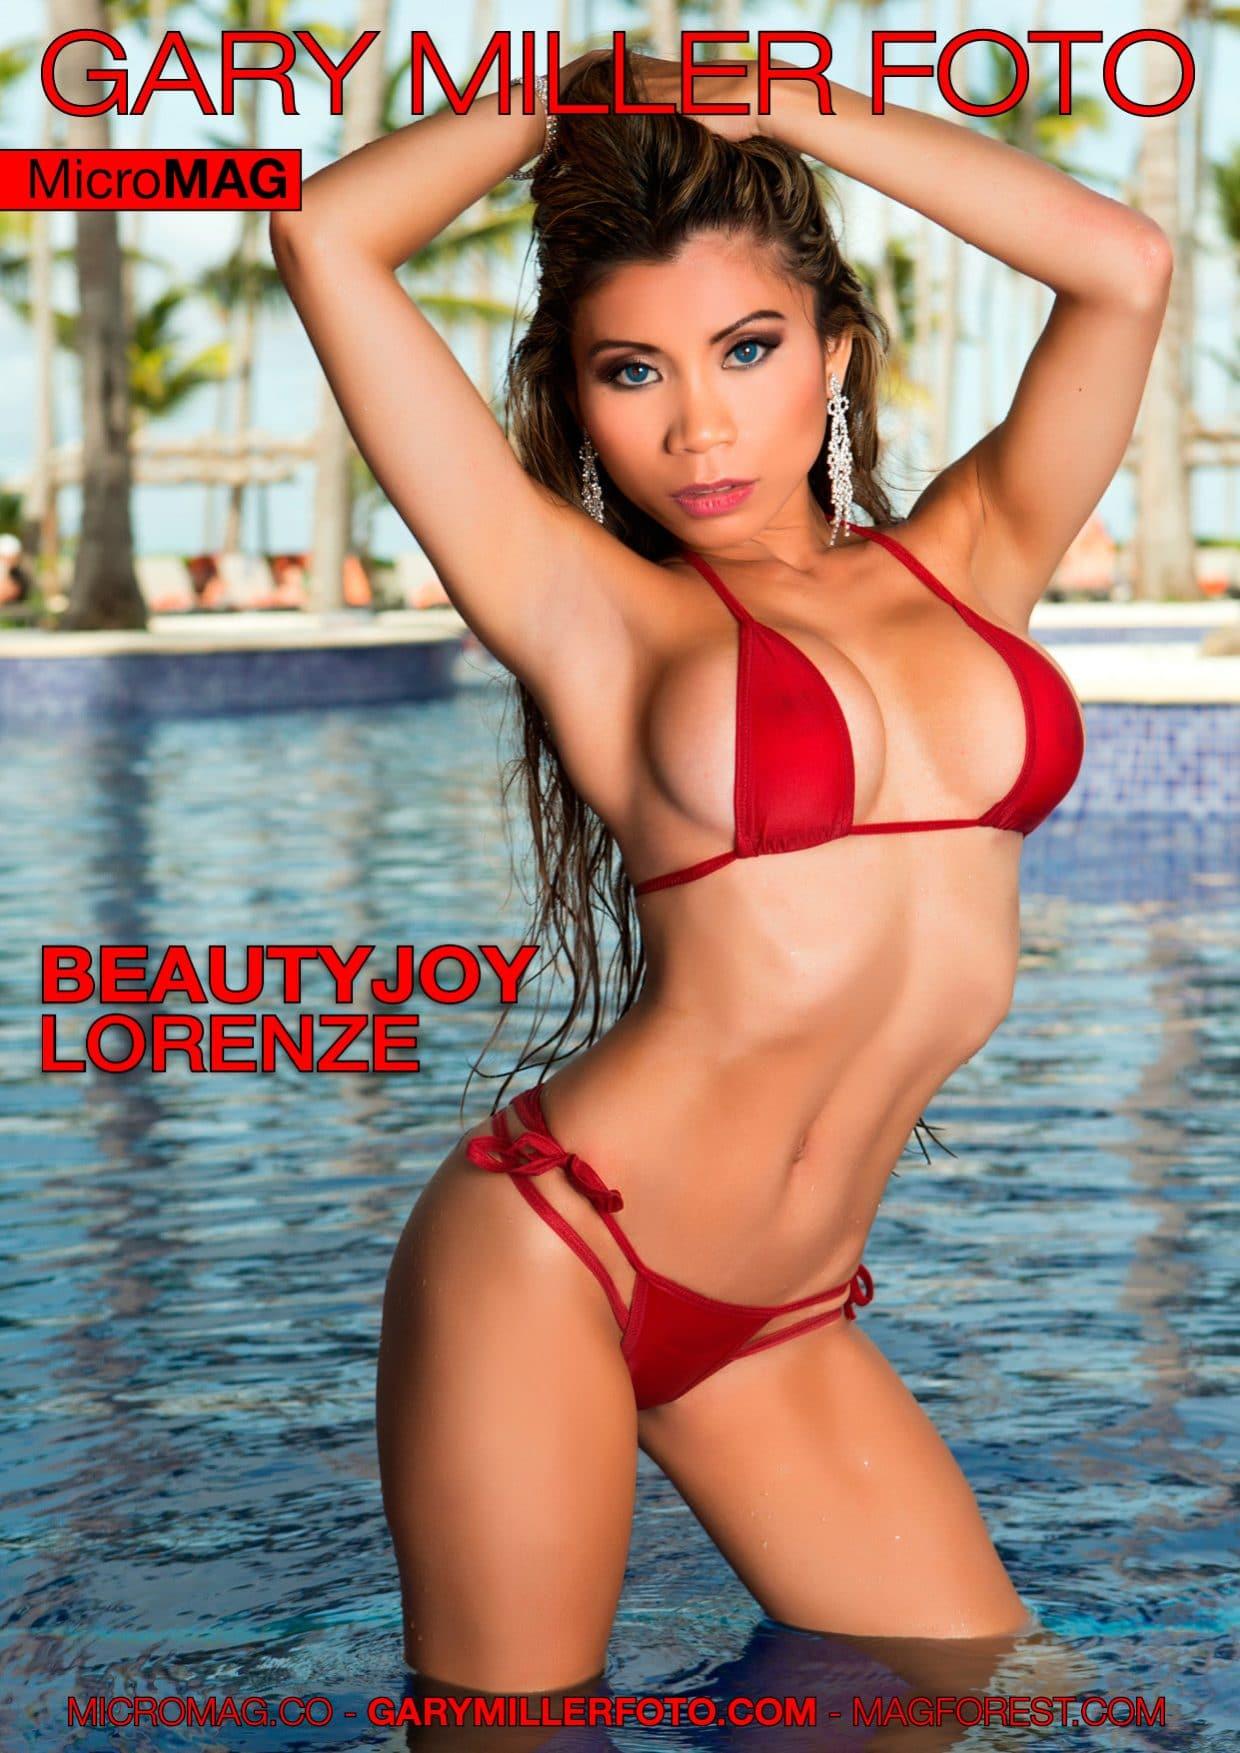 Gary Miller Foto MicroMag - Beautyjoy Lorenze 1